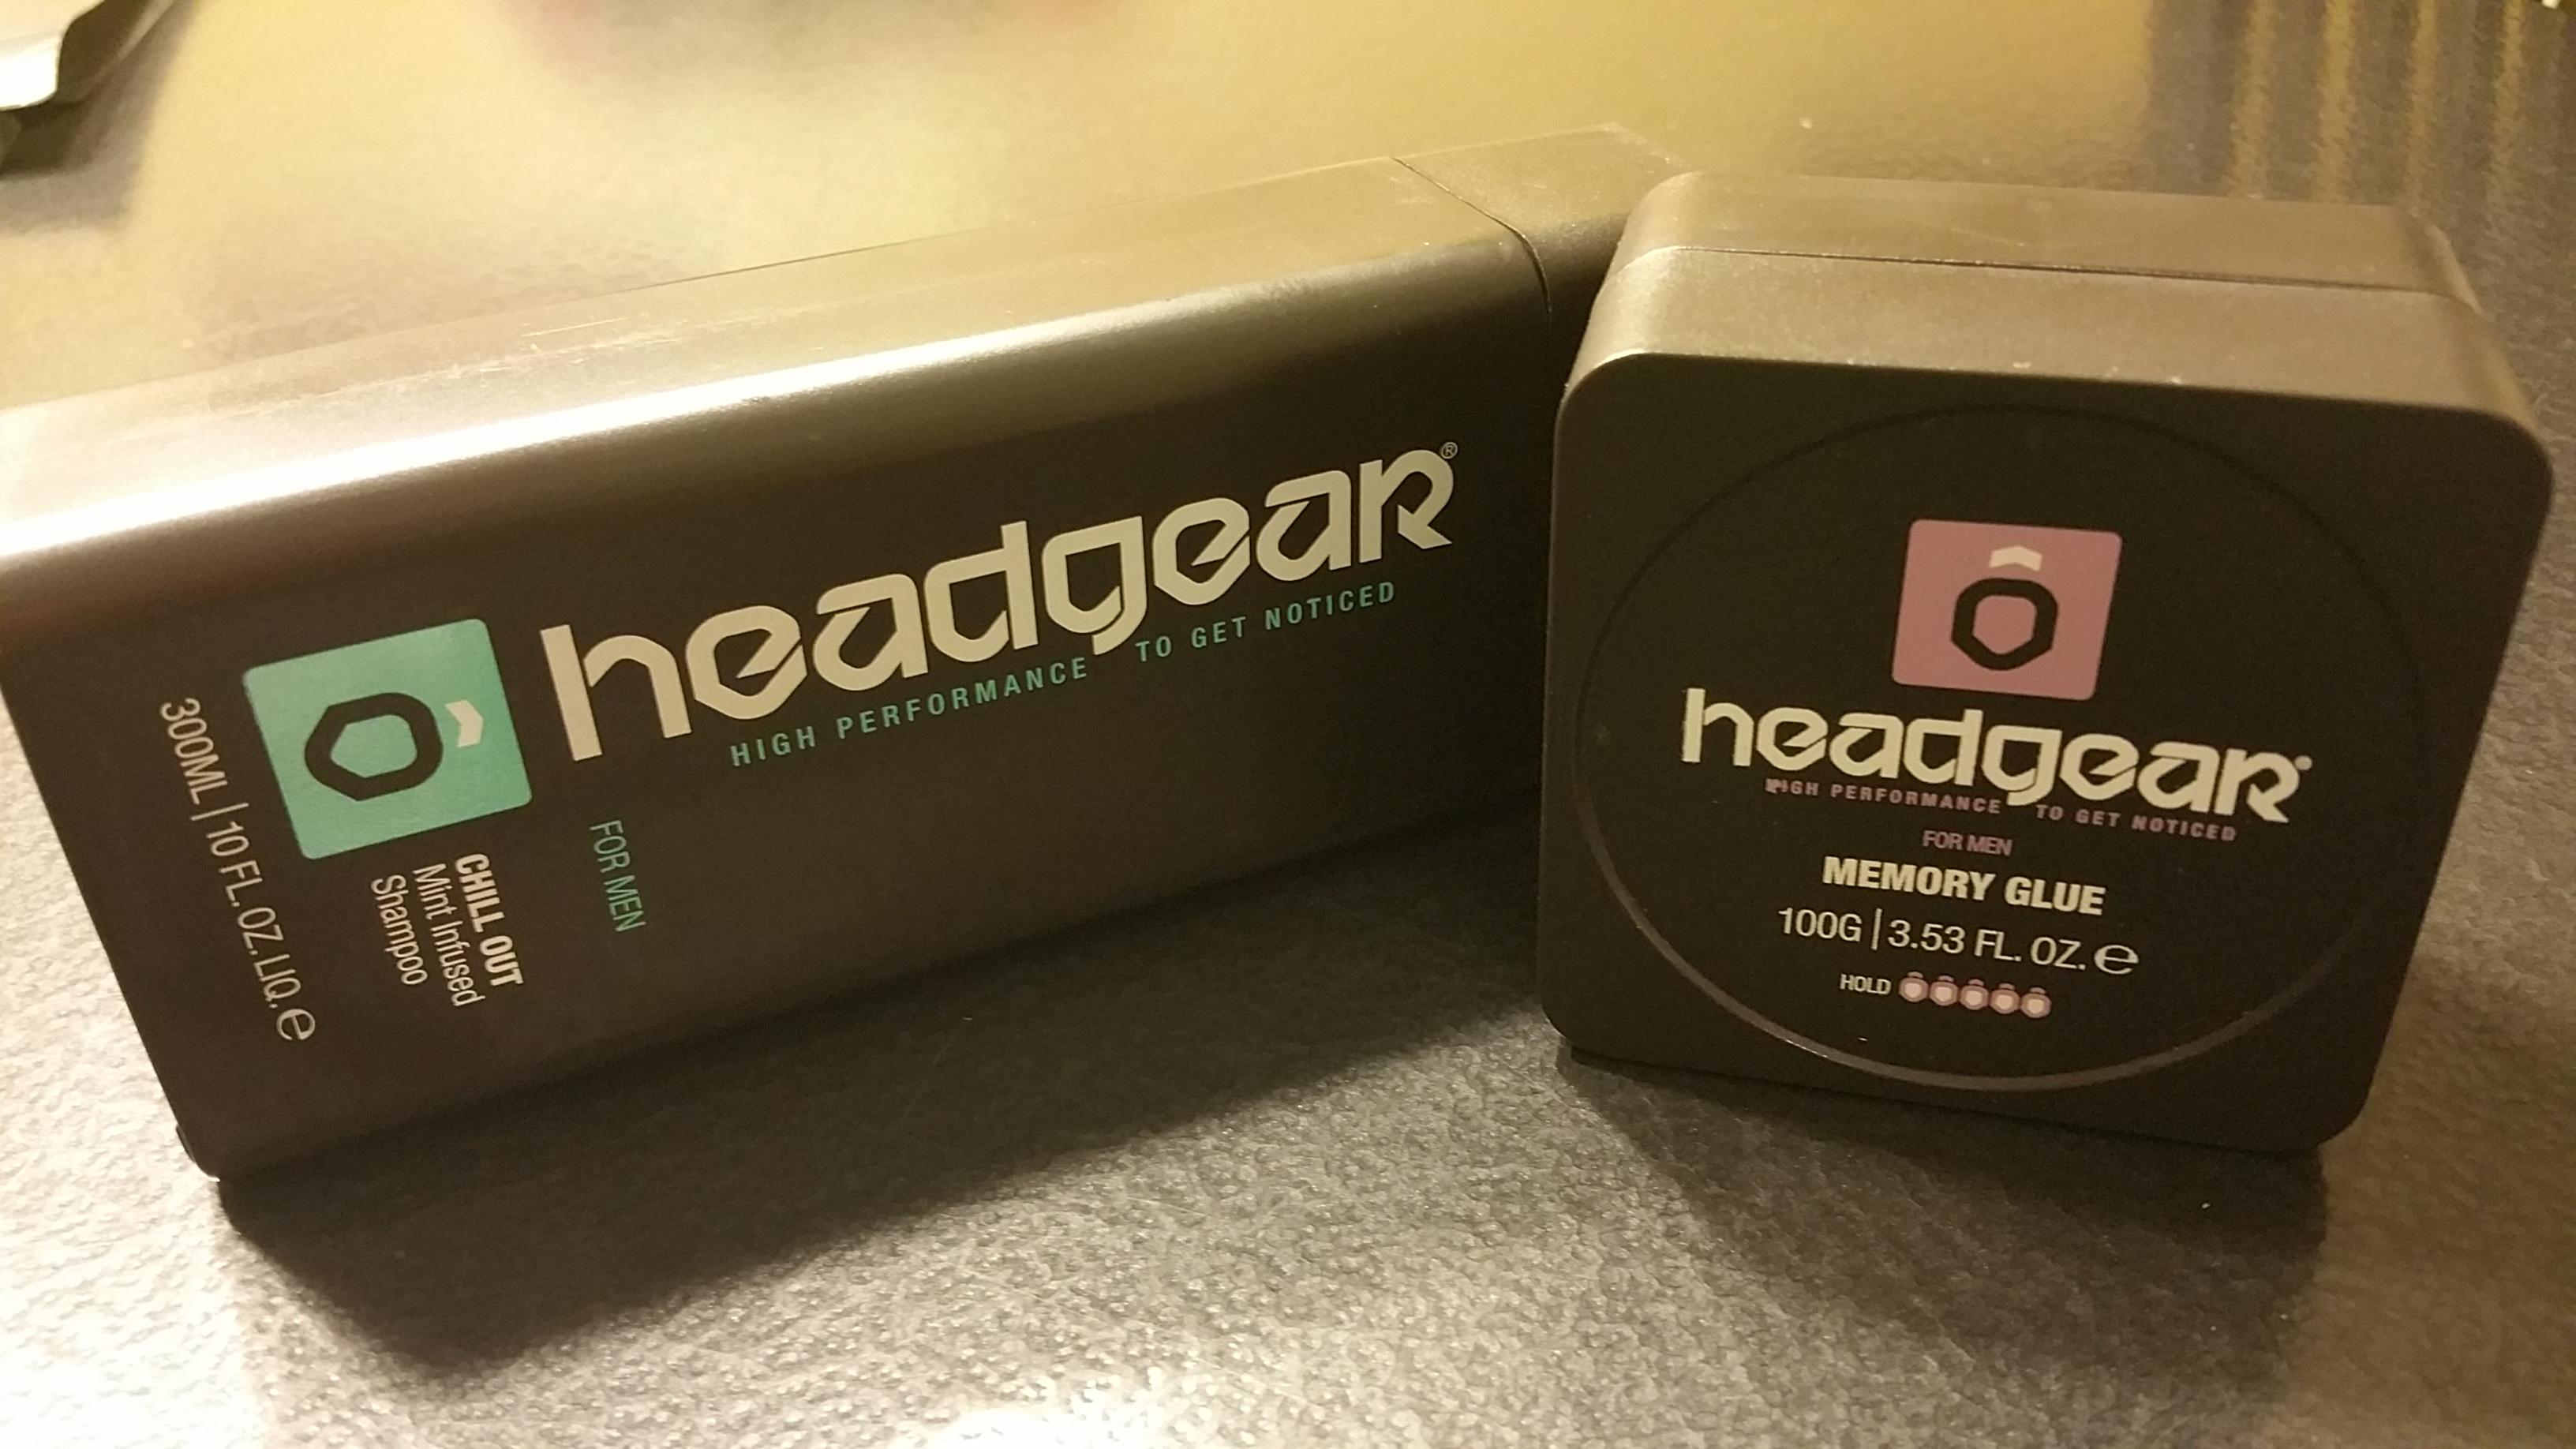 HEADGEAR Chill Out Shampoo & Memory Glue